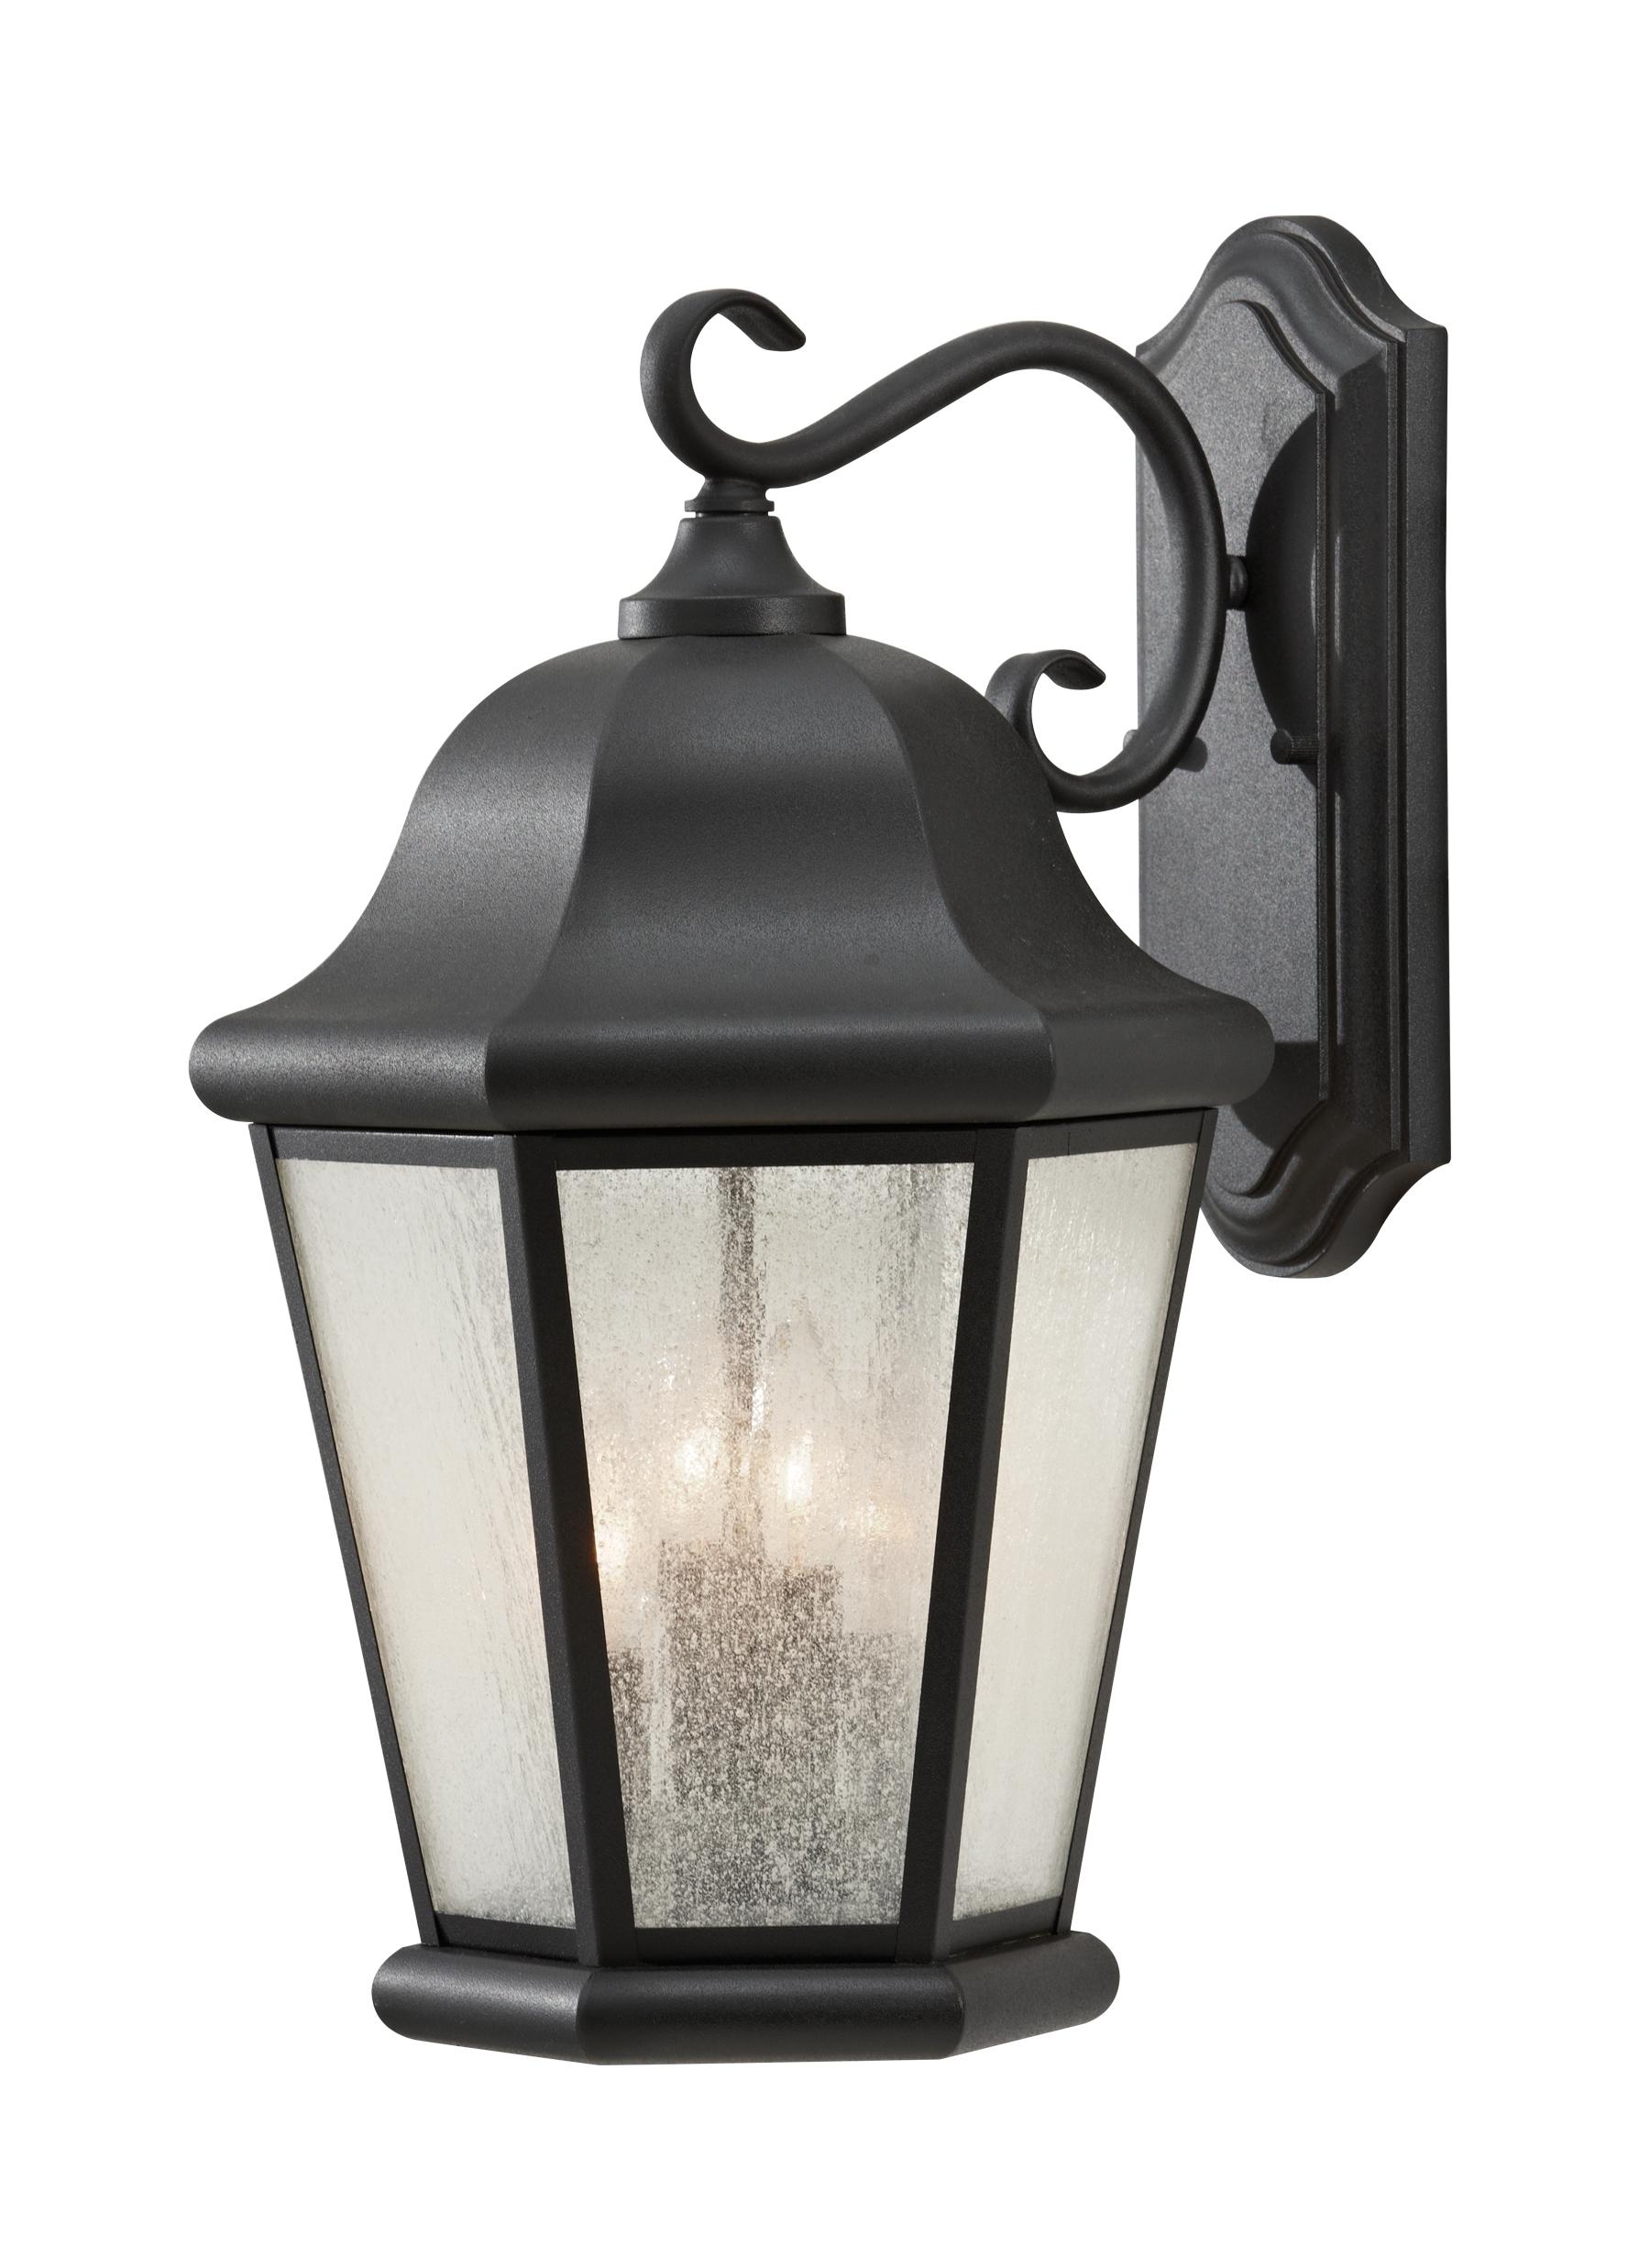 Ol5904Bk,4-Light Outdoor Lantern,black throughout Outdoor Lanterns on Stands (Image 7 of 20)